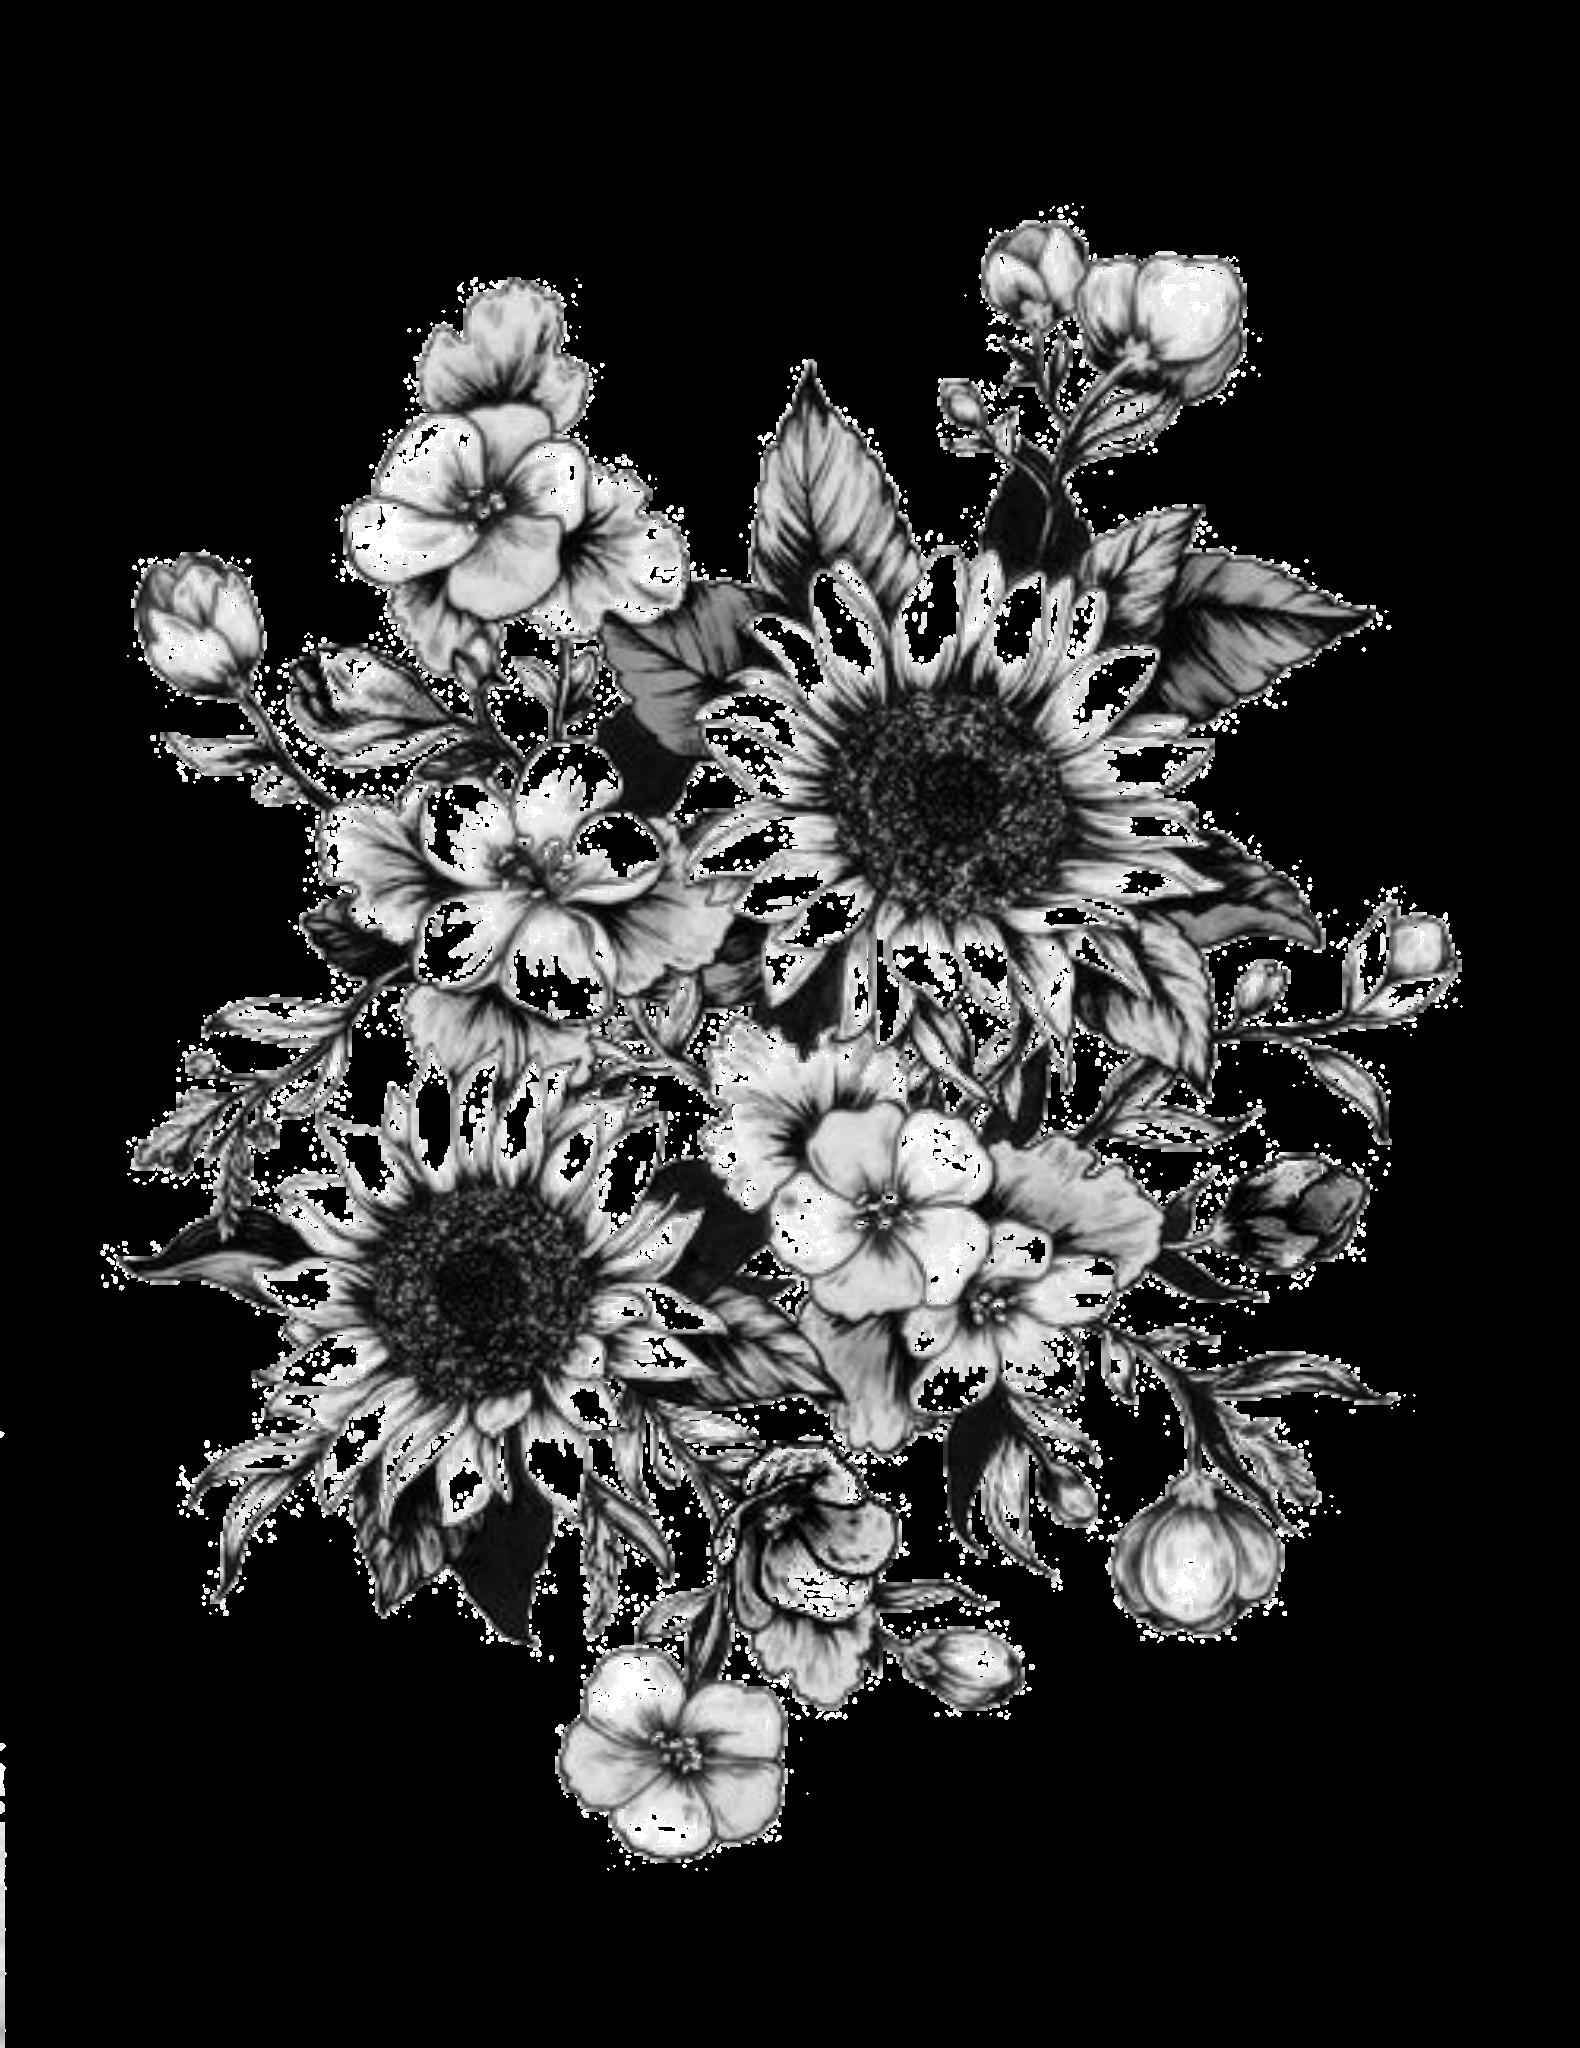 Tattoo Sketch Wildflower Tattoo Sunflower Tattoo Sleeve Forearm Flower Tattoo